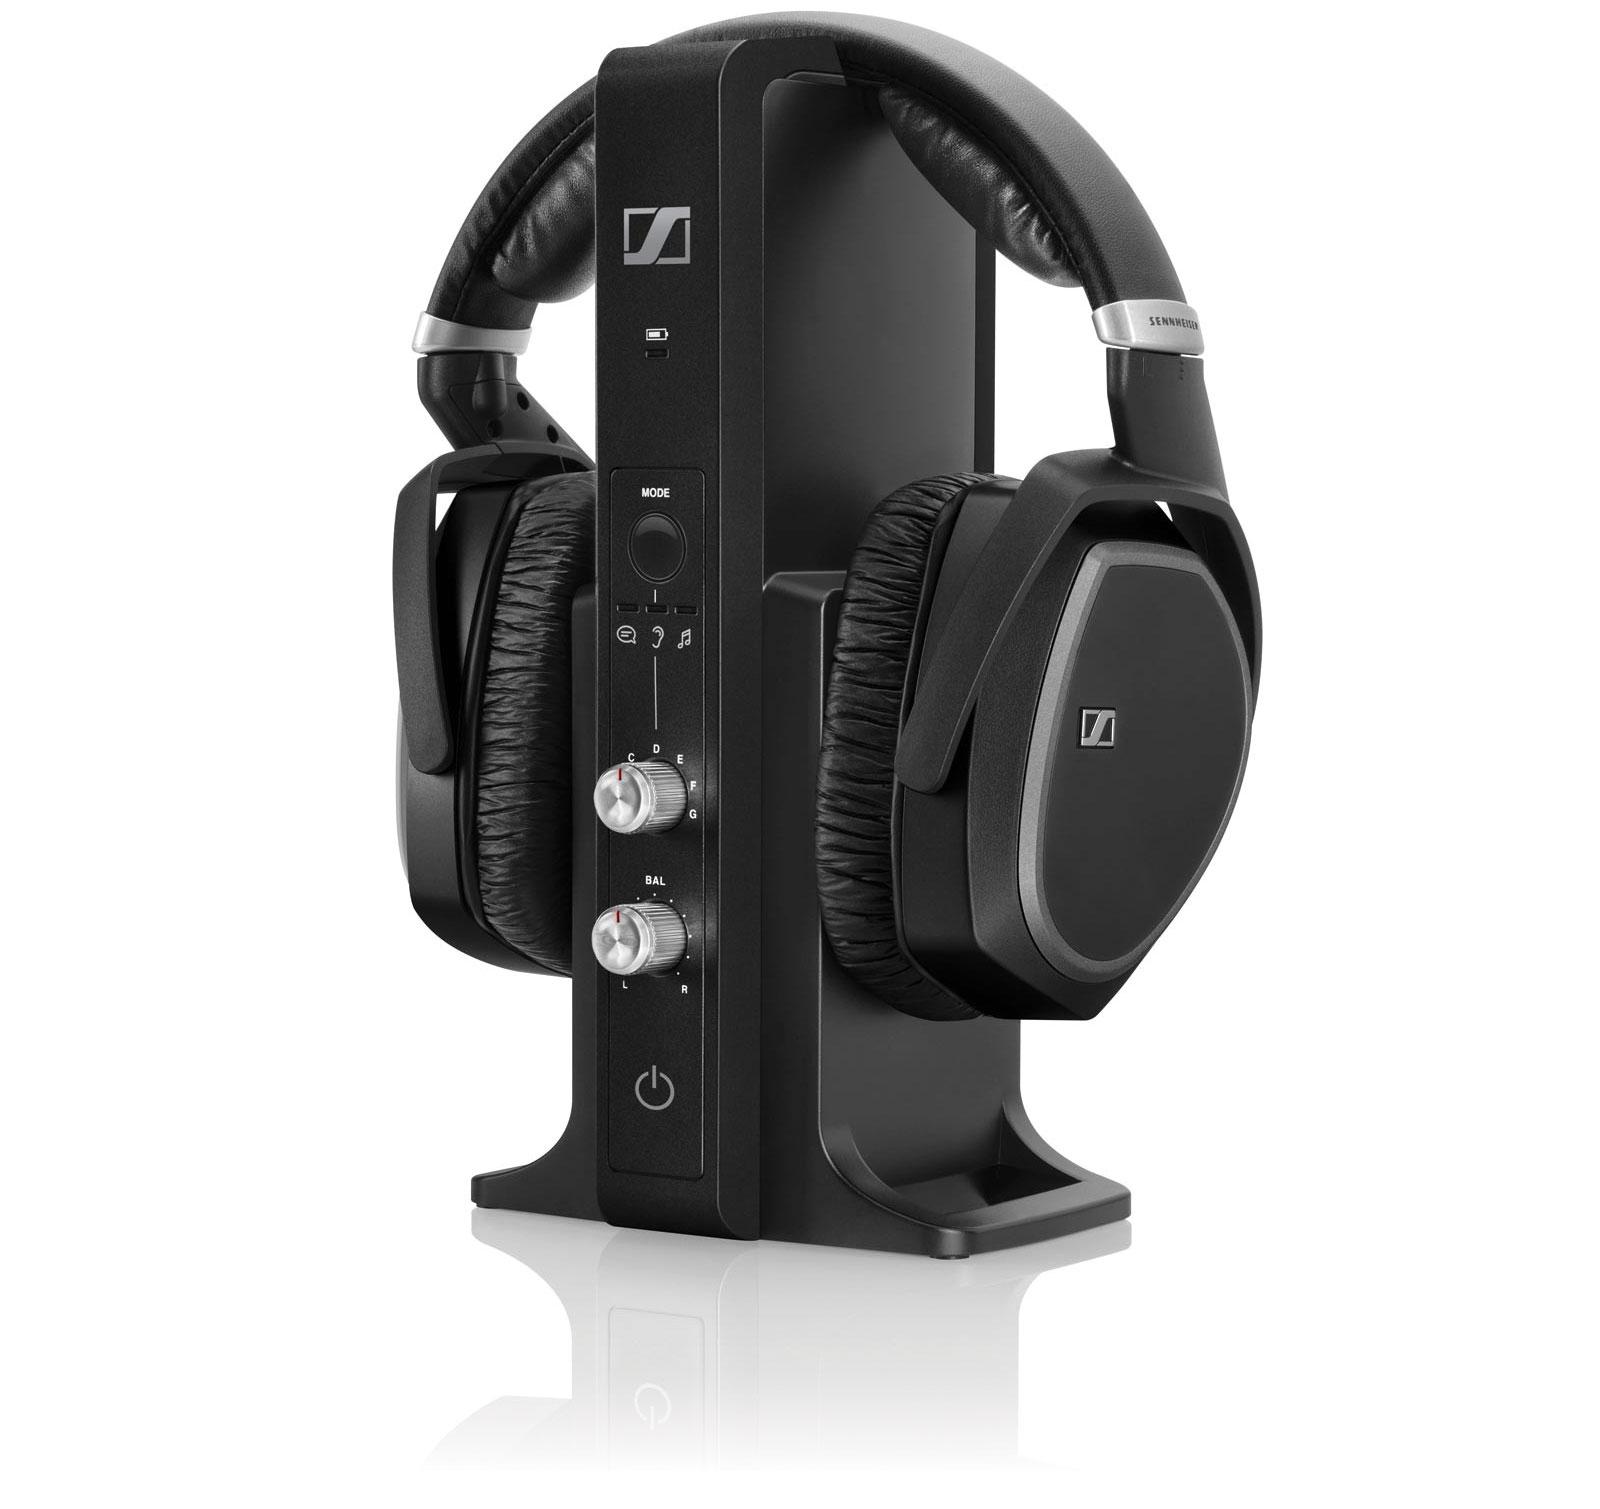 Sennheiser RS 195 TV Digital Wireless Headset Headphones